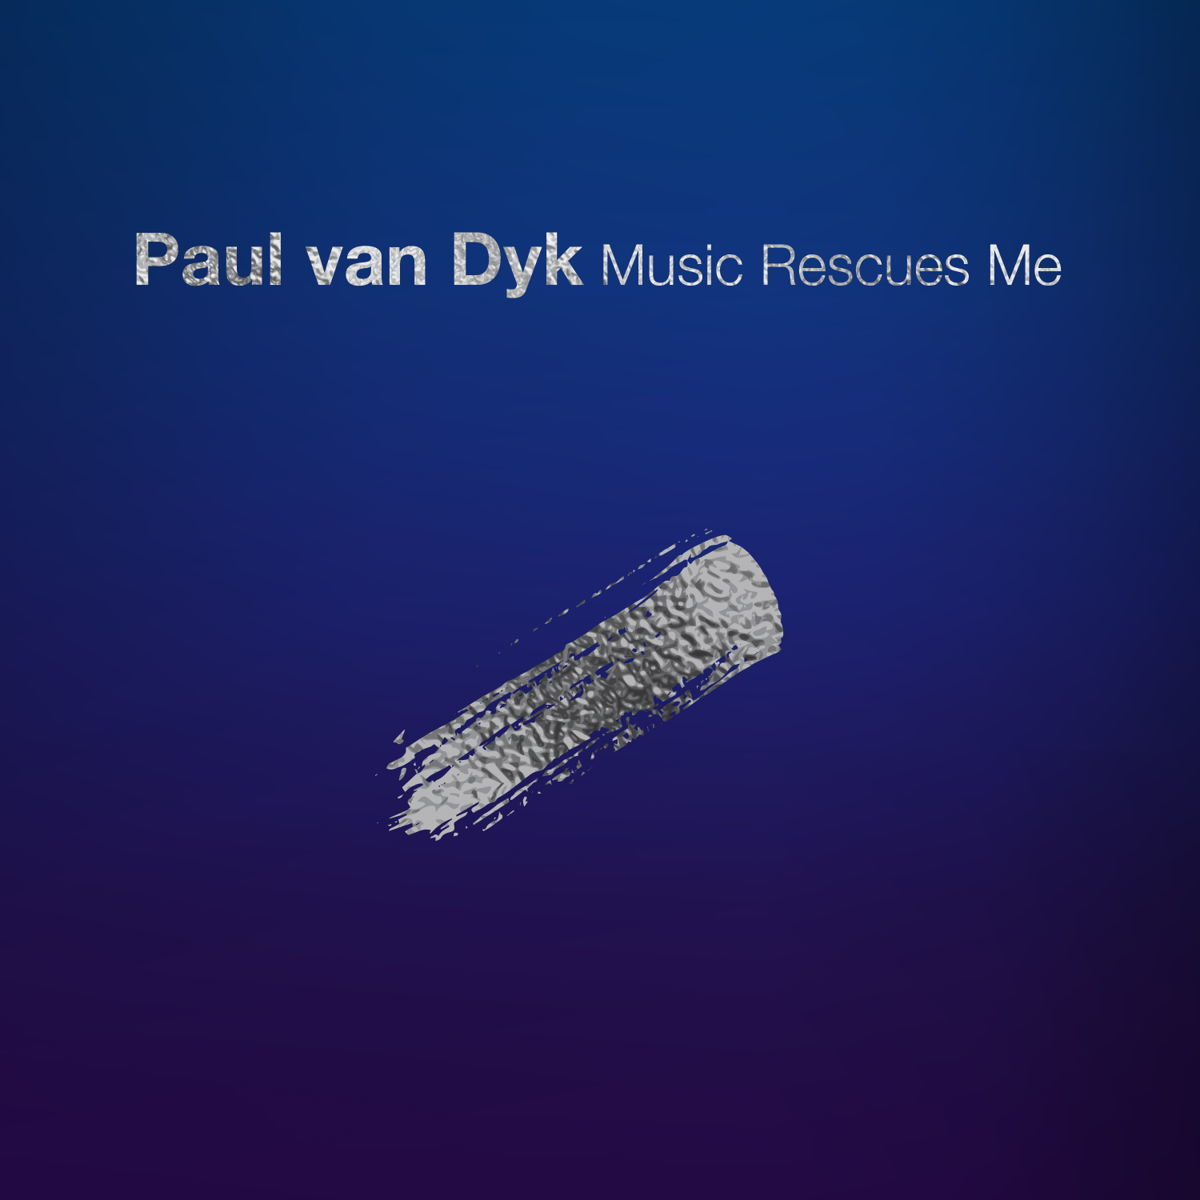 Paul van Dyk Music Rescues Me Album Cover